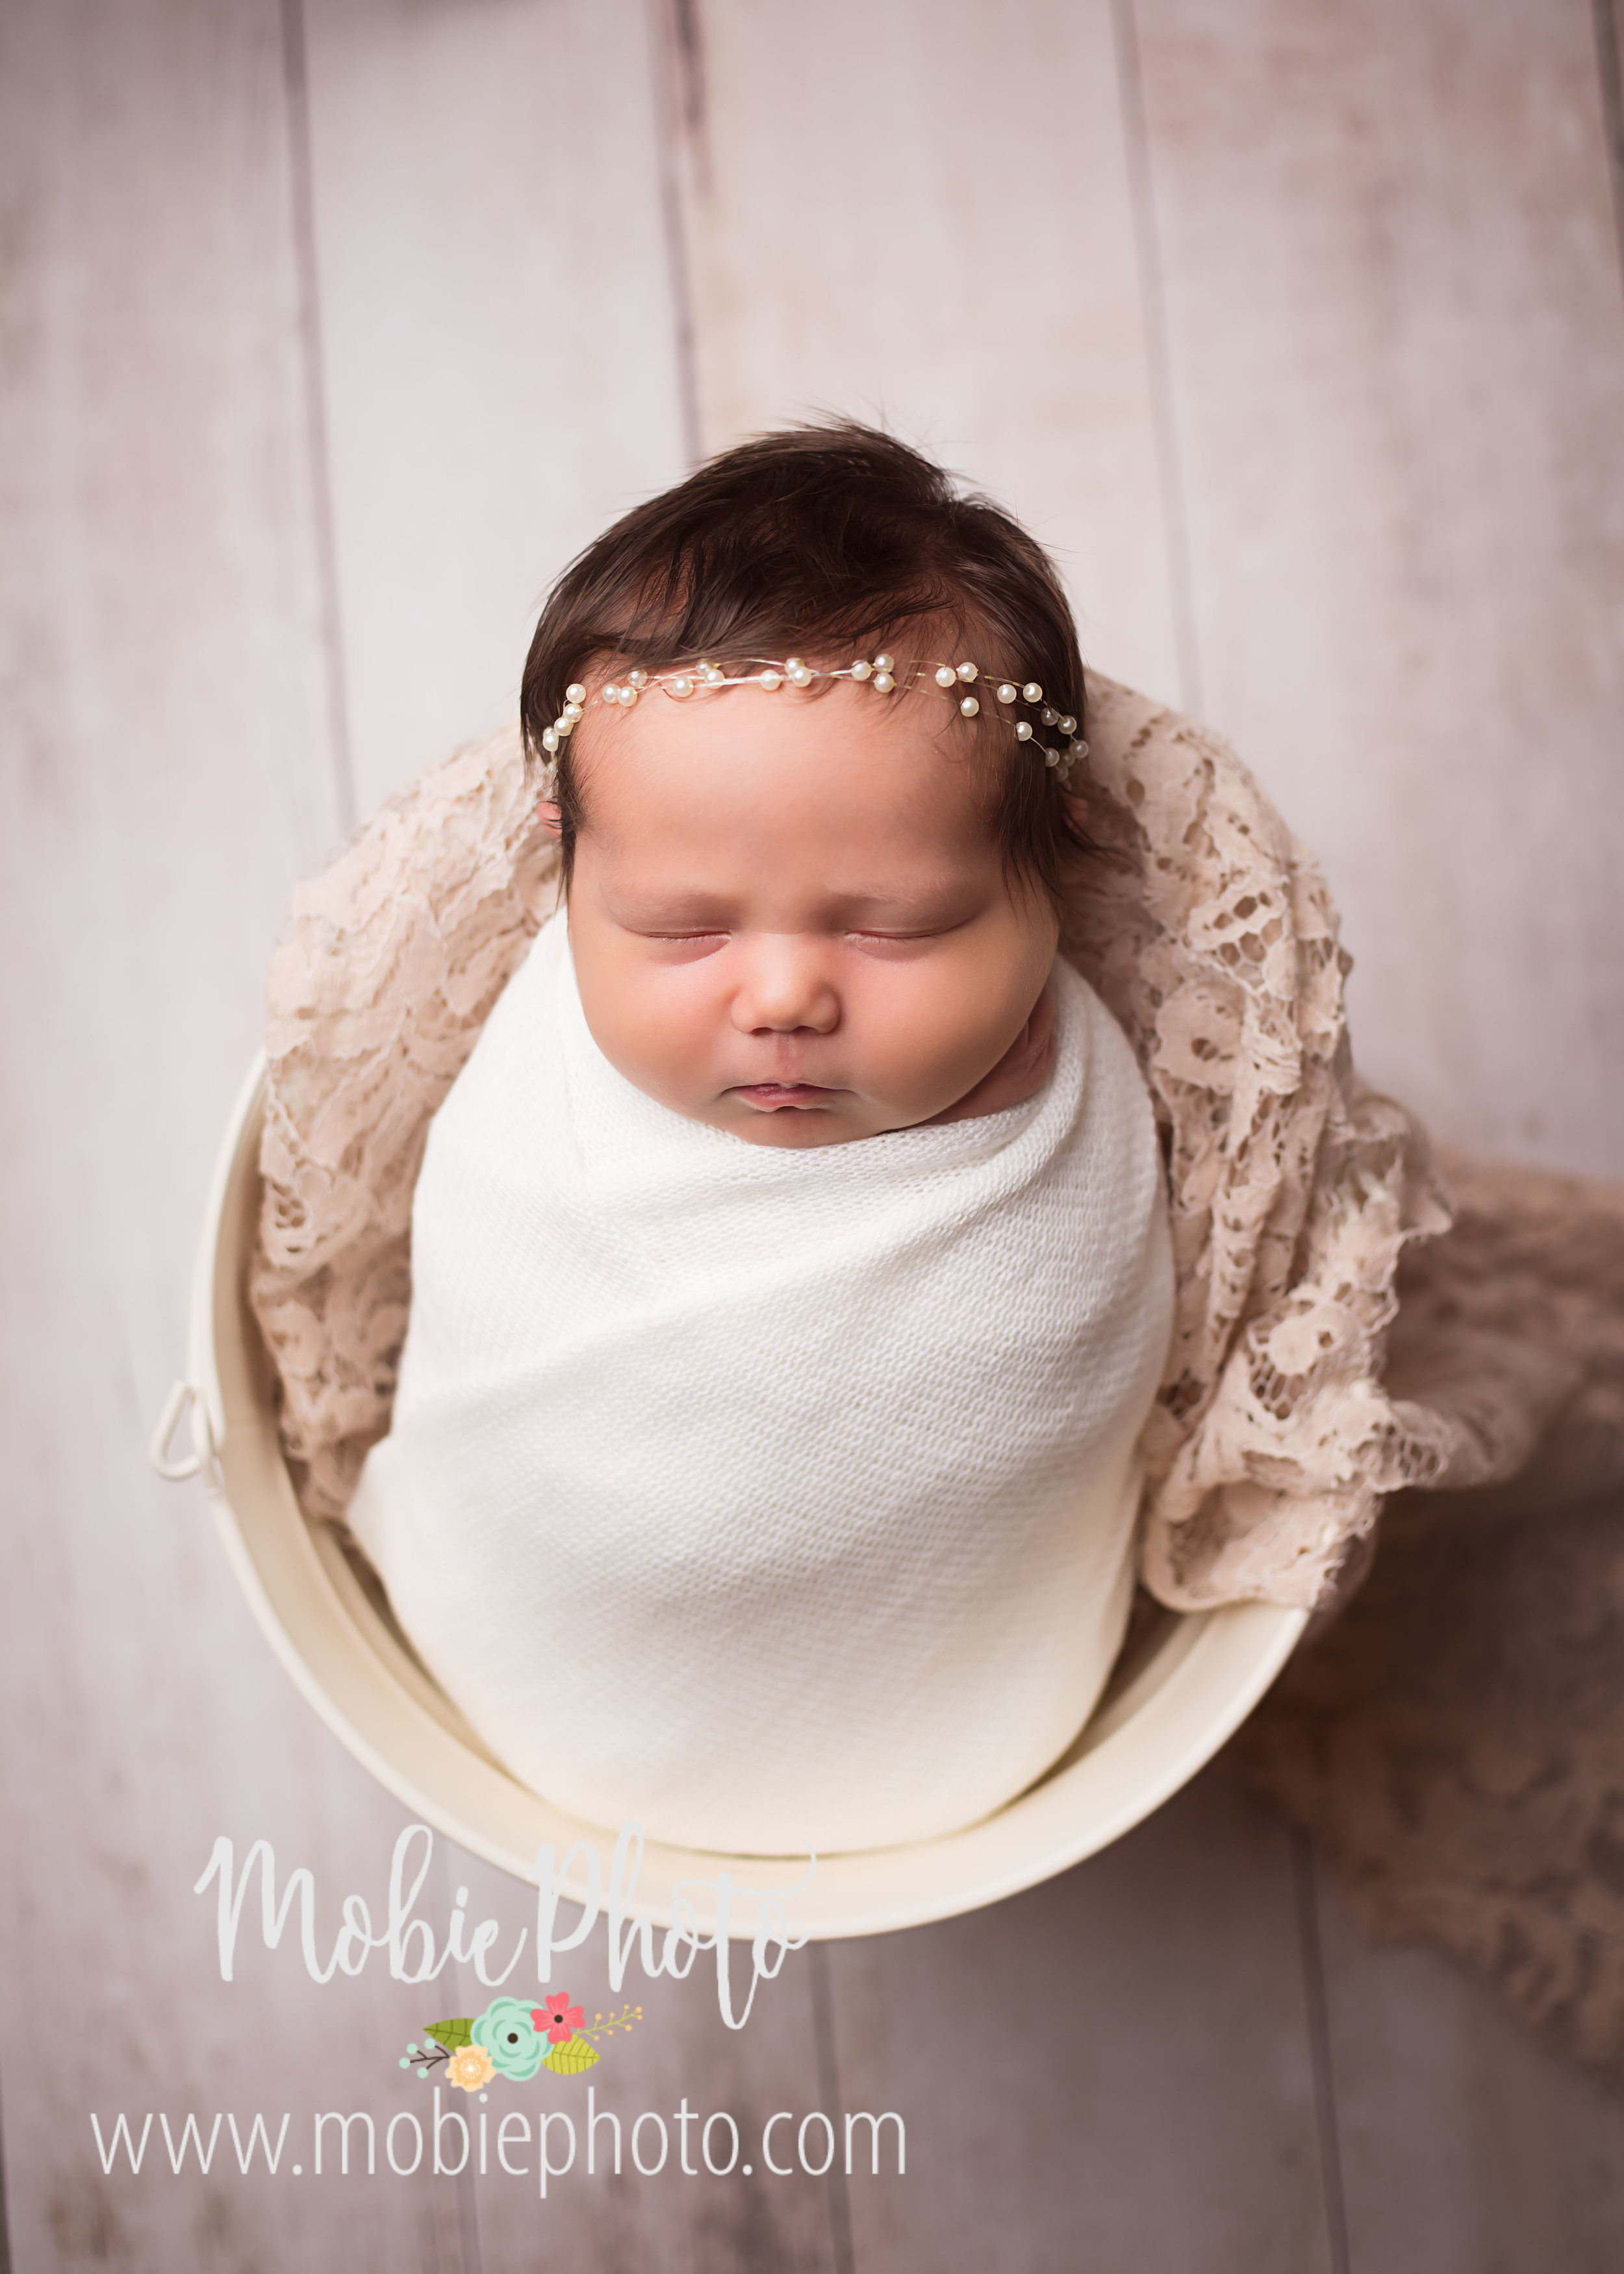 Full Studio Newborn Session at Mobie Photo - Utah Newborn Photography